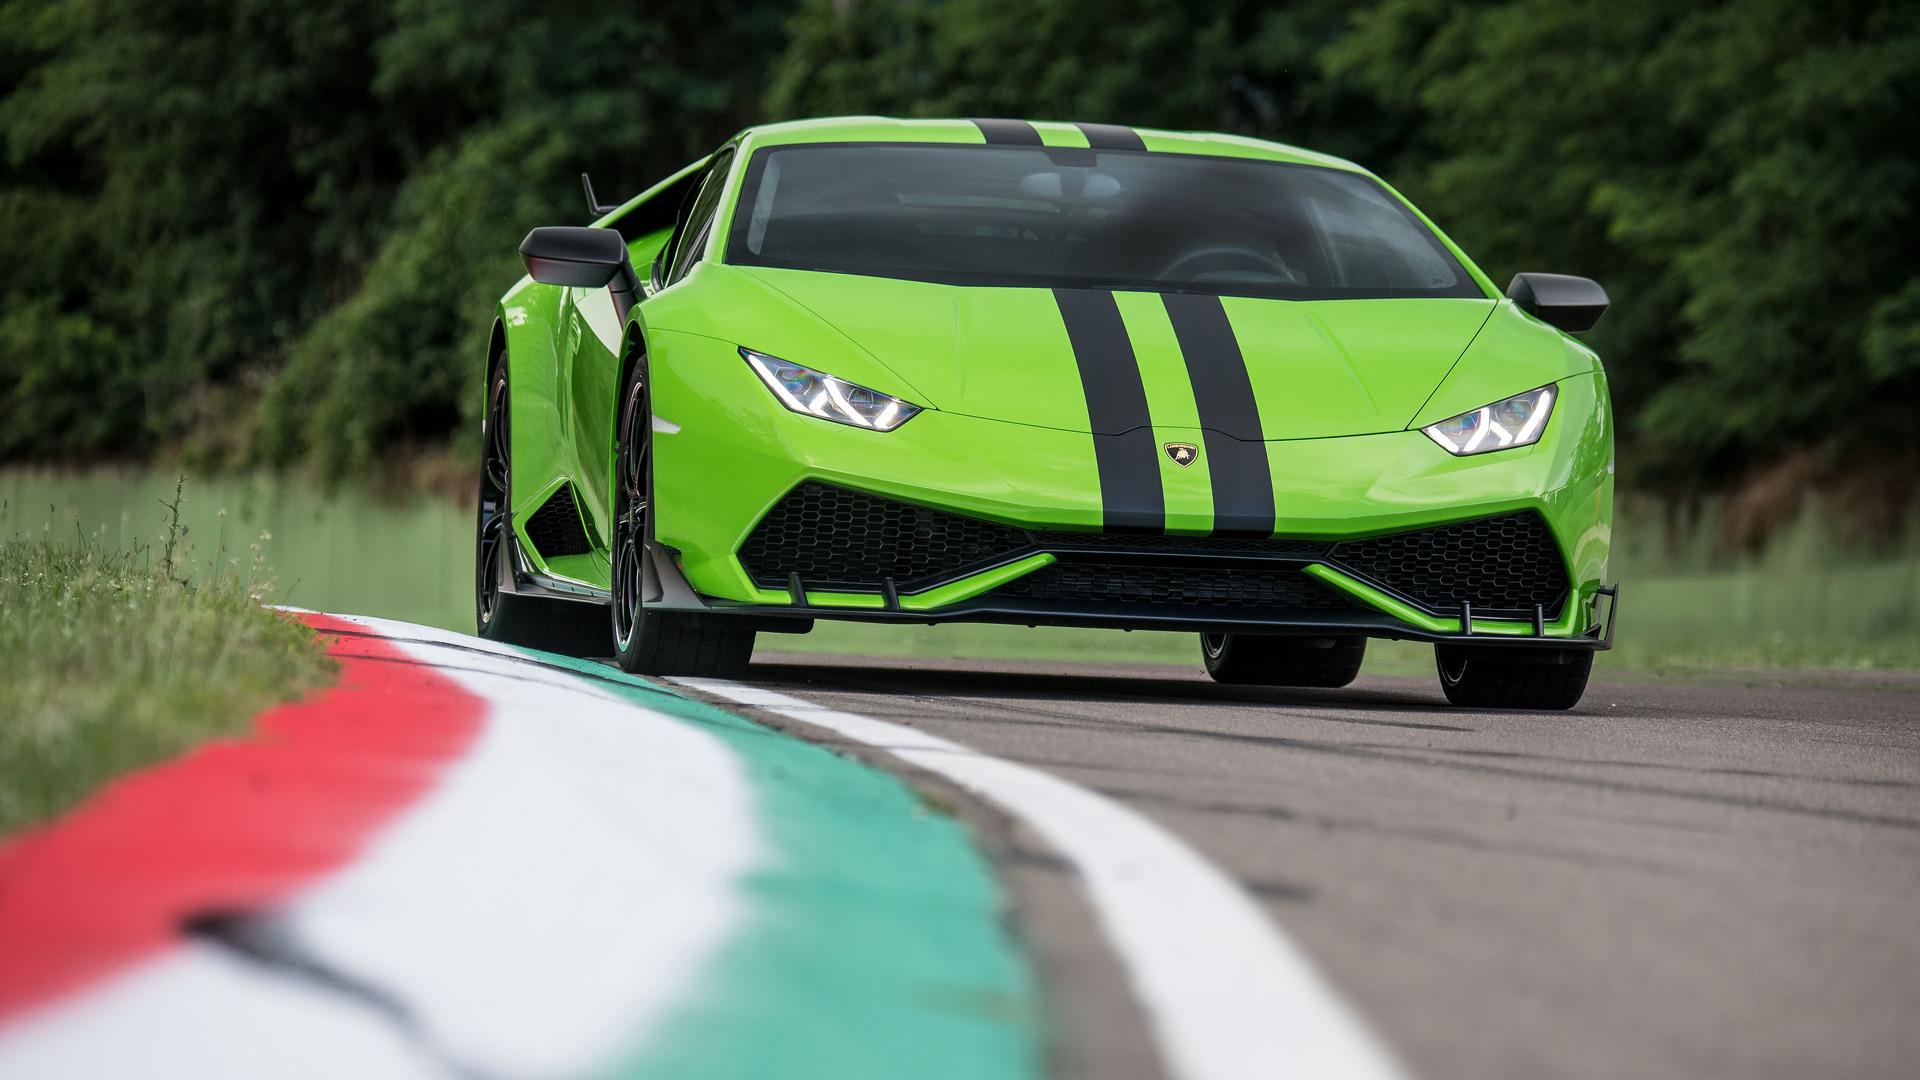 Lamborghini Huracan gets optional racing stripes and center-lock wheels